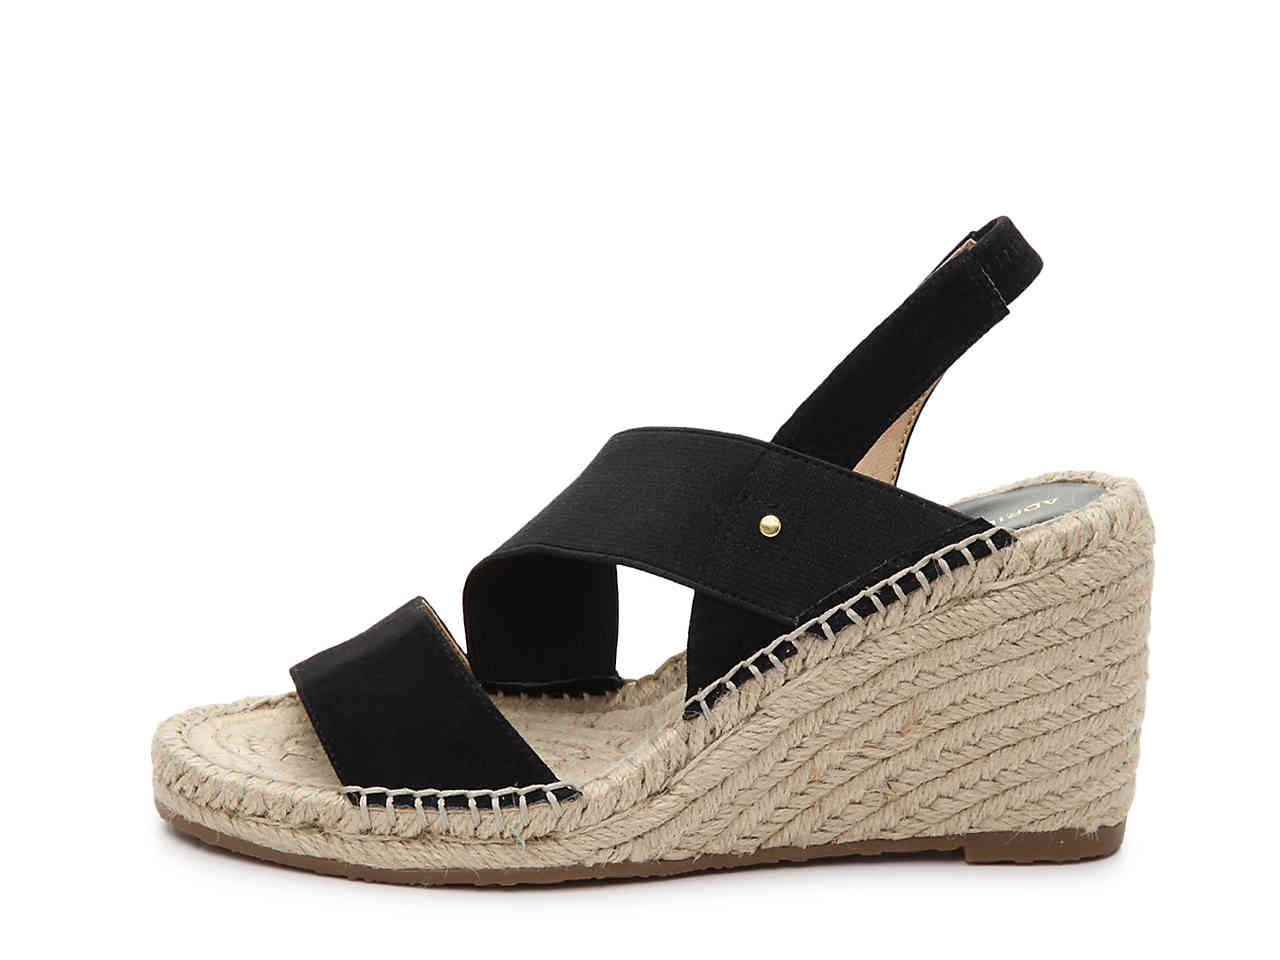 d391a7b5c82 Adrienne Vittadini Black Crete Espadrille Wedge Sandal